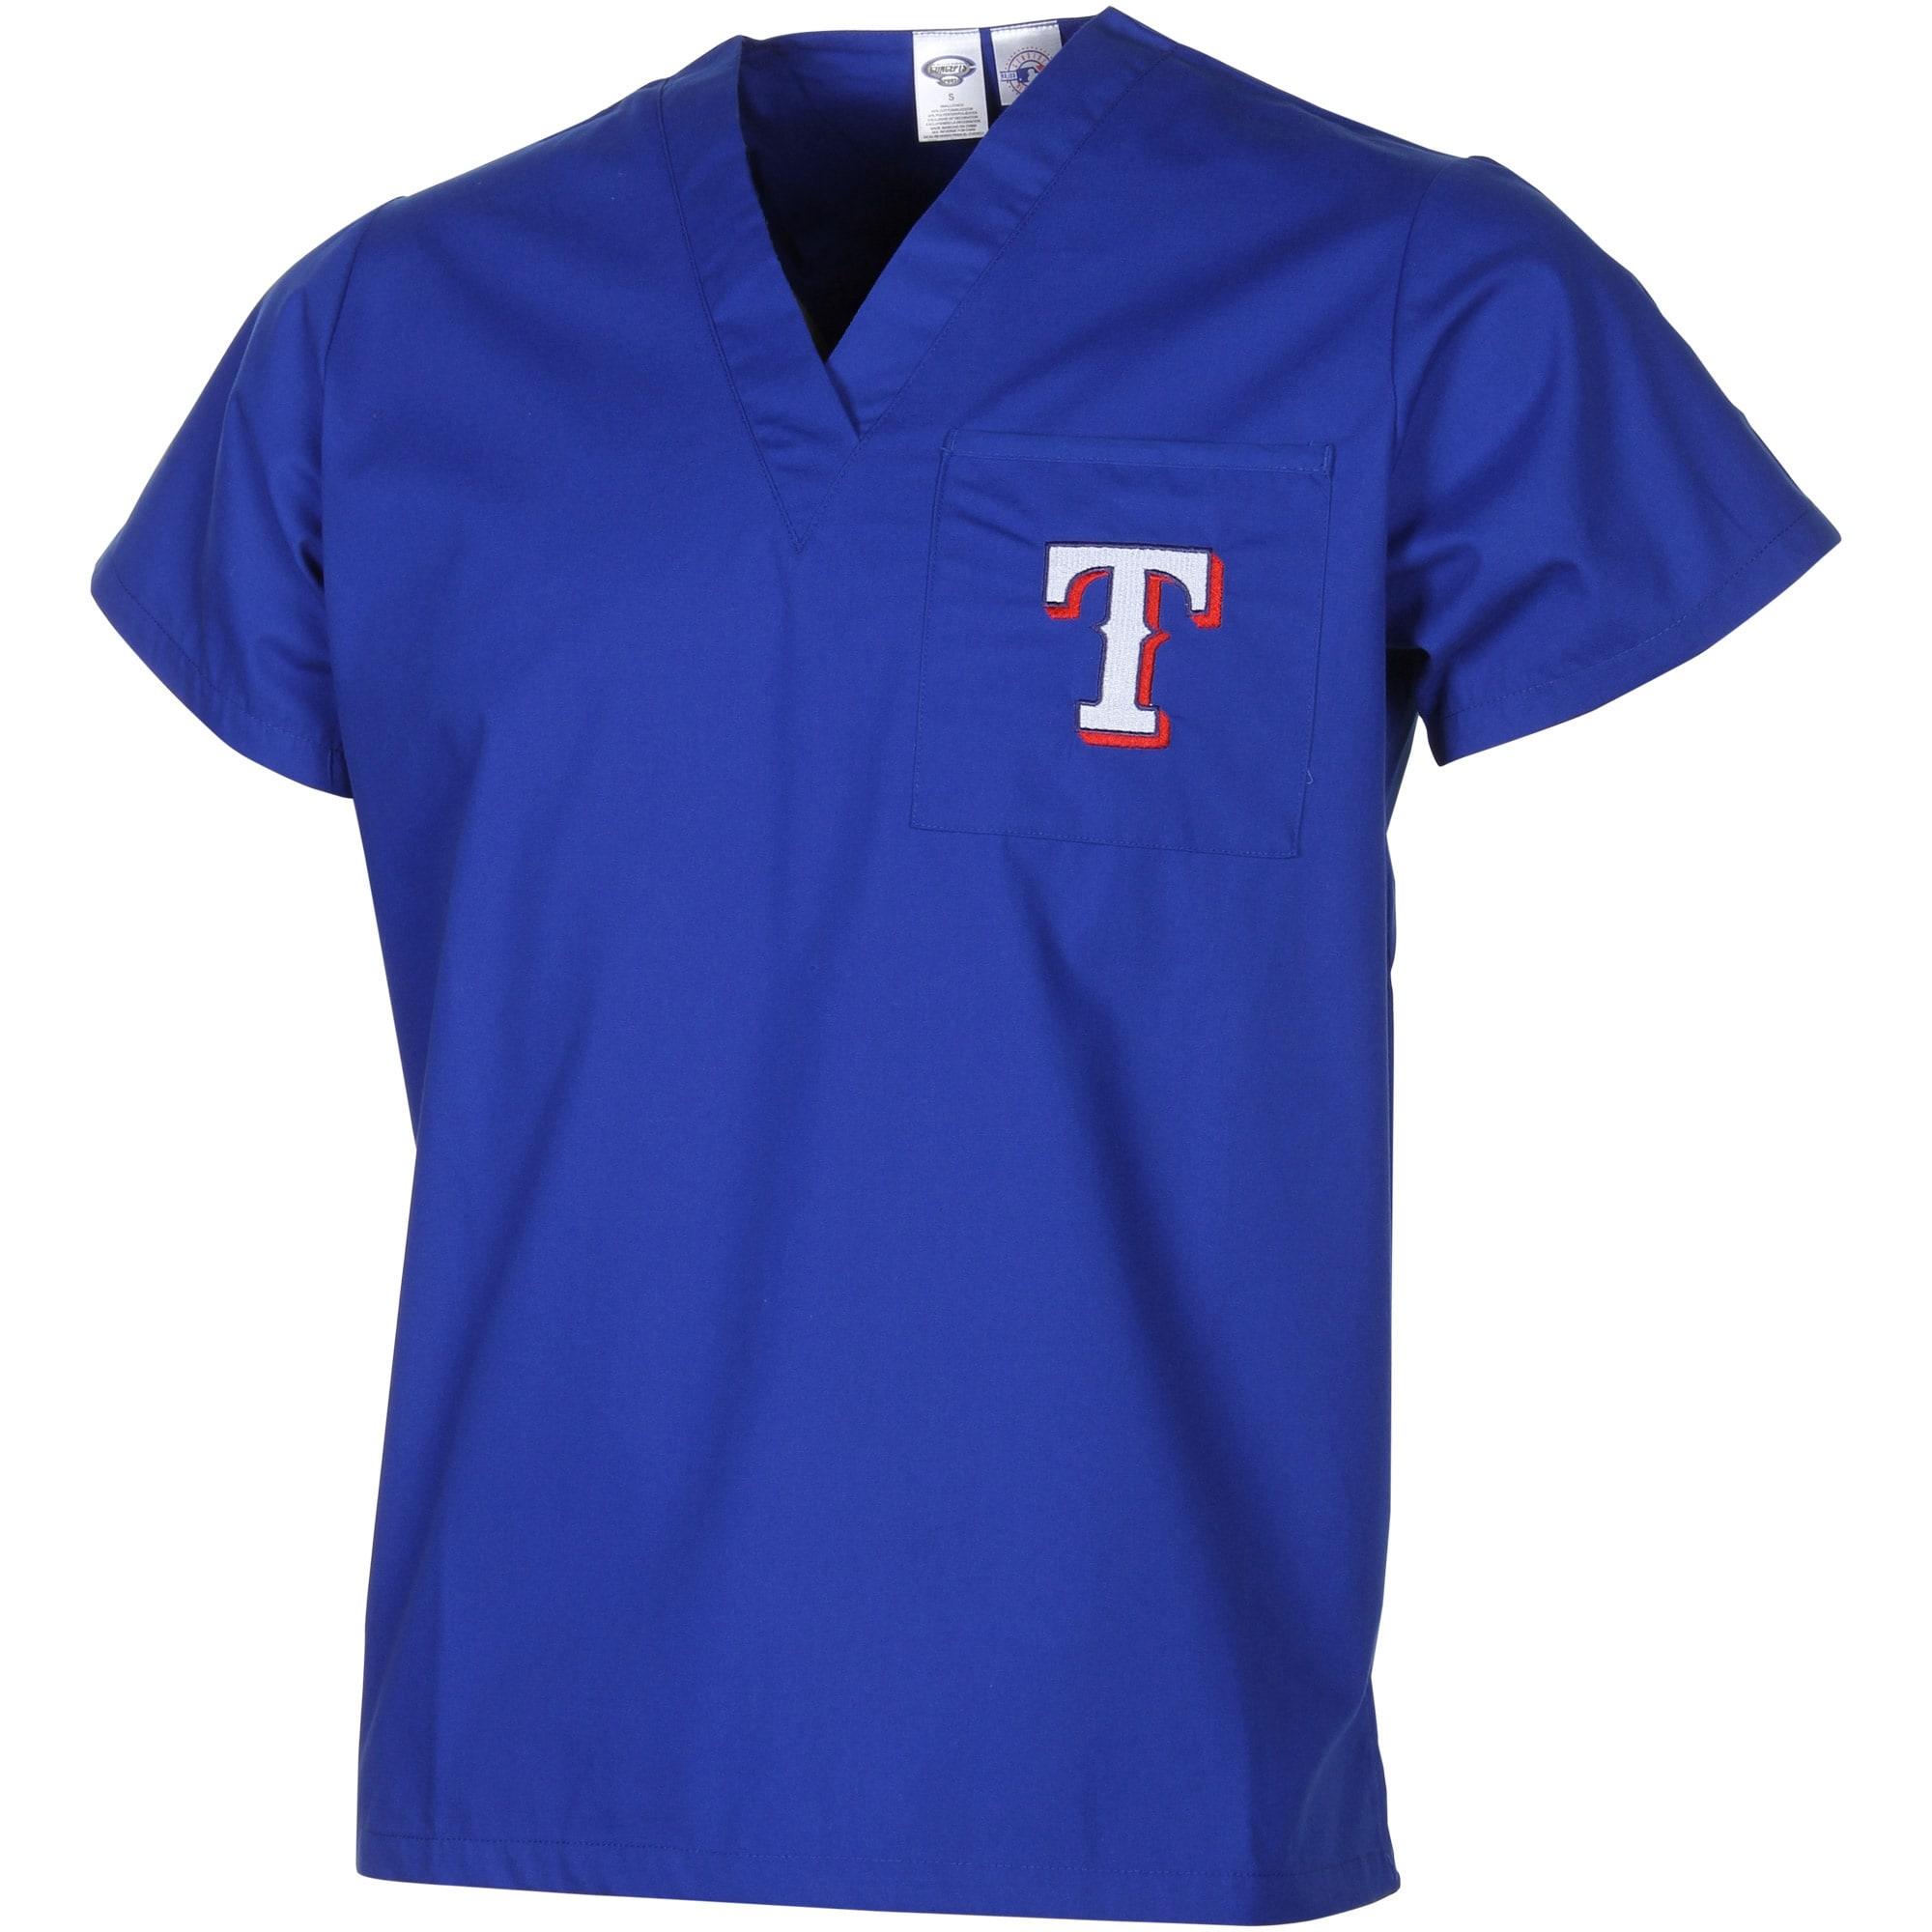 Texas Rangers Unisex Scrub Top - Royal Blue